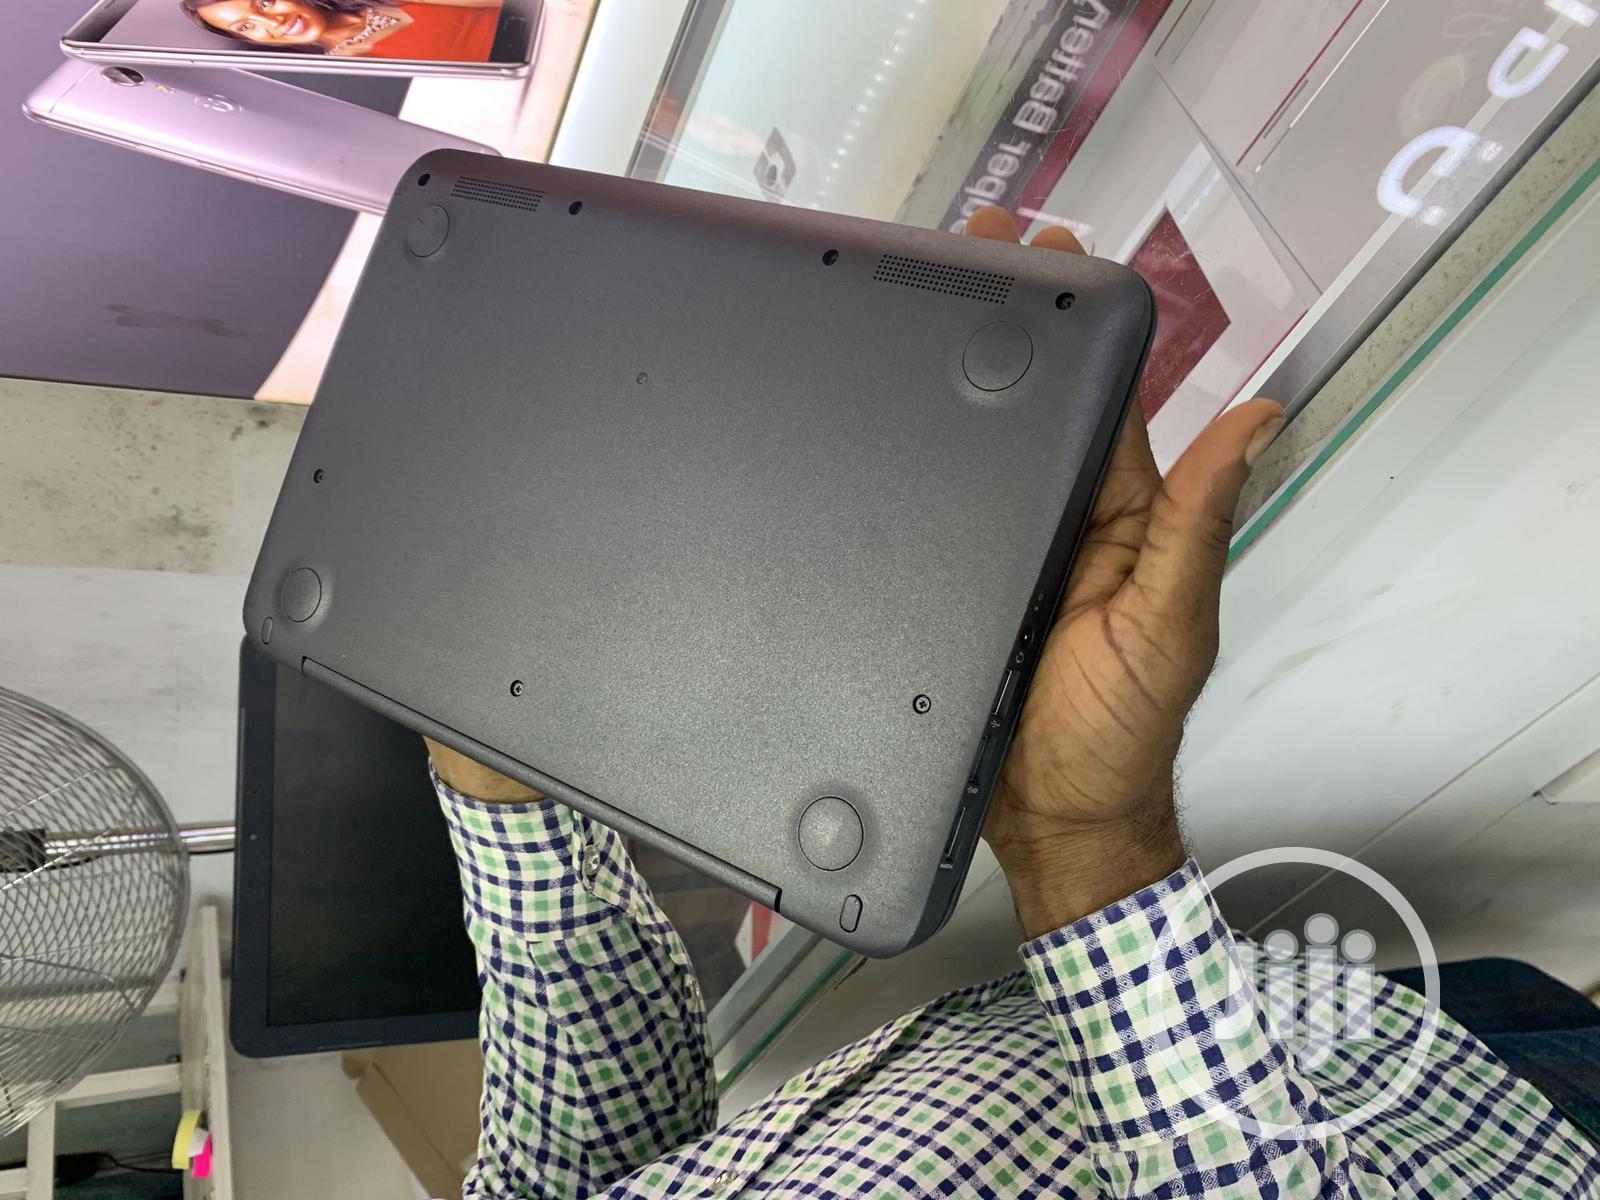 New Laptop HP Stream 11 4GB Intel Celeron SSD 32GB | Laptops & Computers for sale in Ikeja, Lagos State, Nigeria